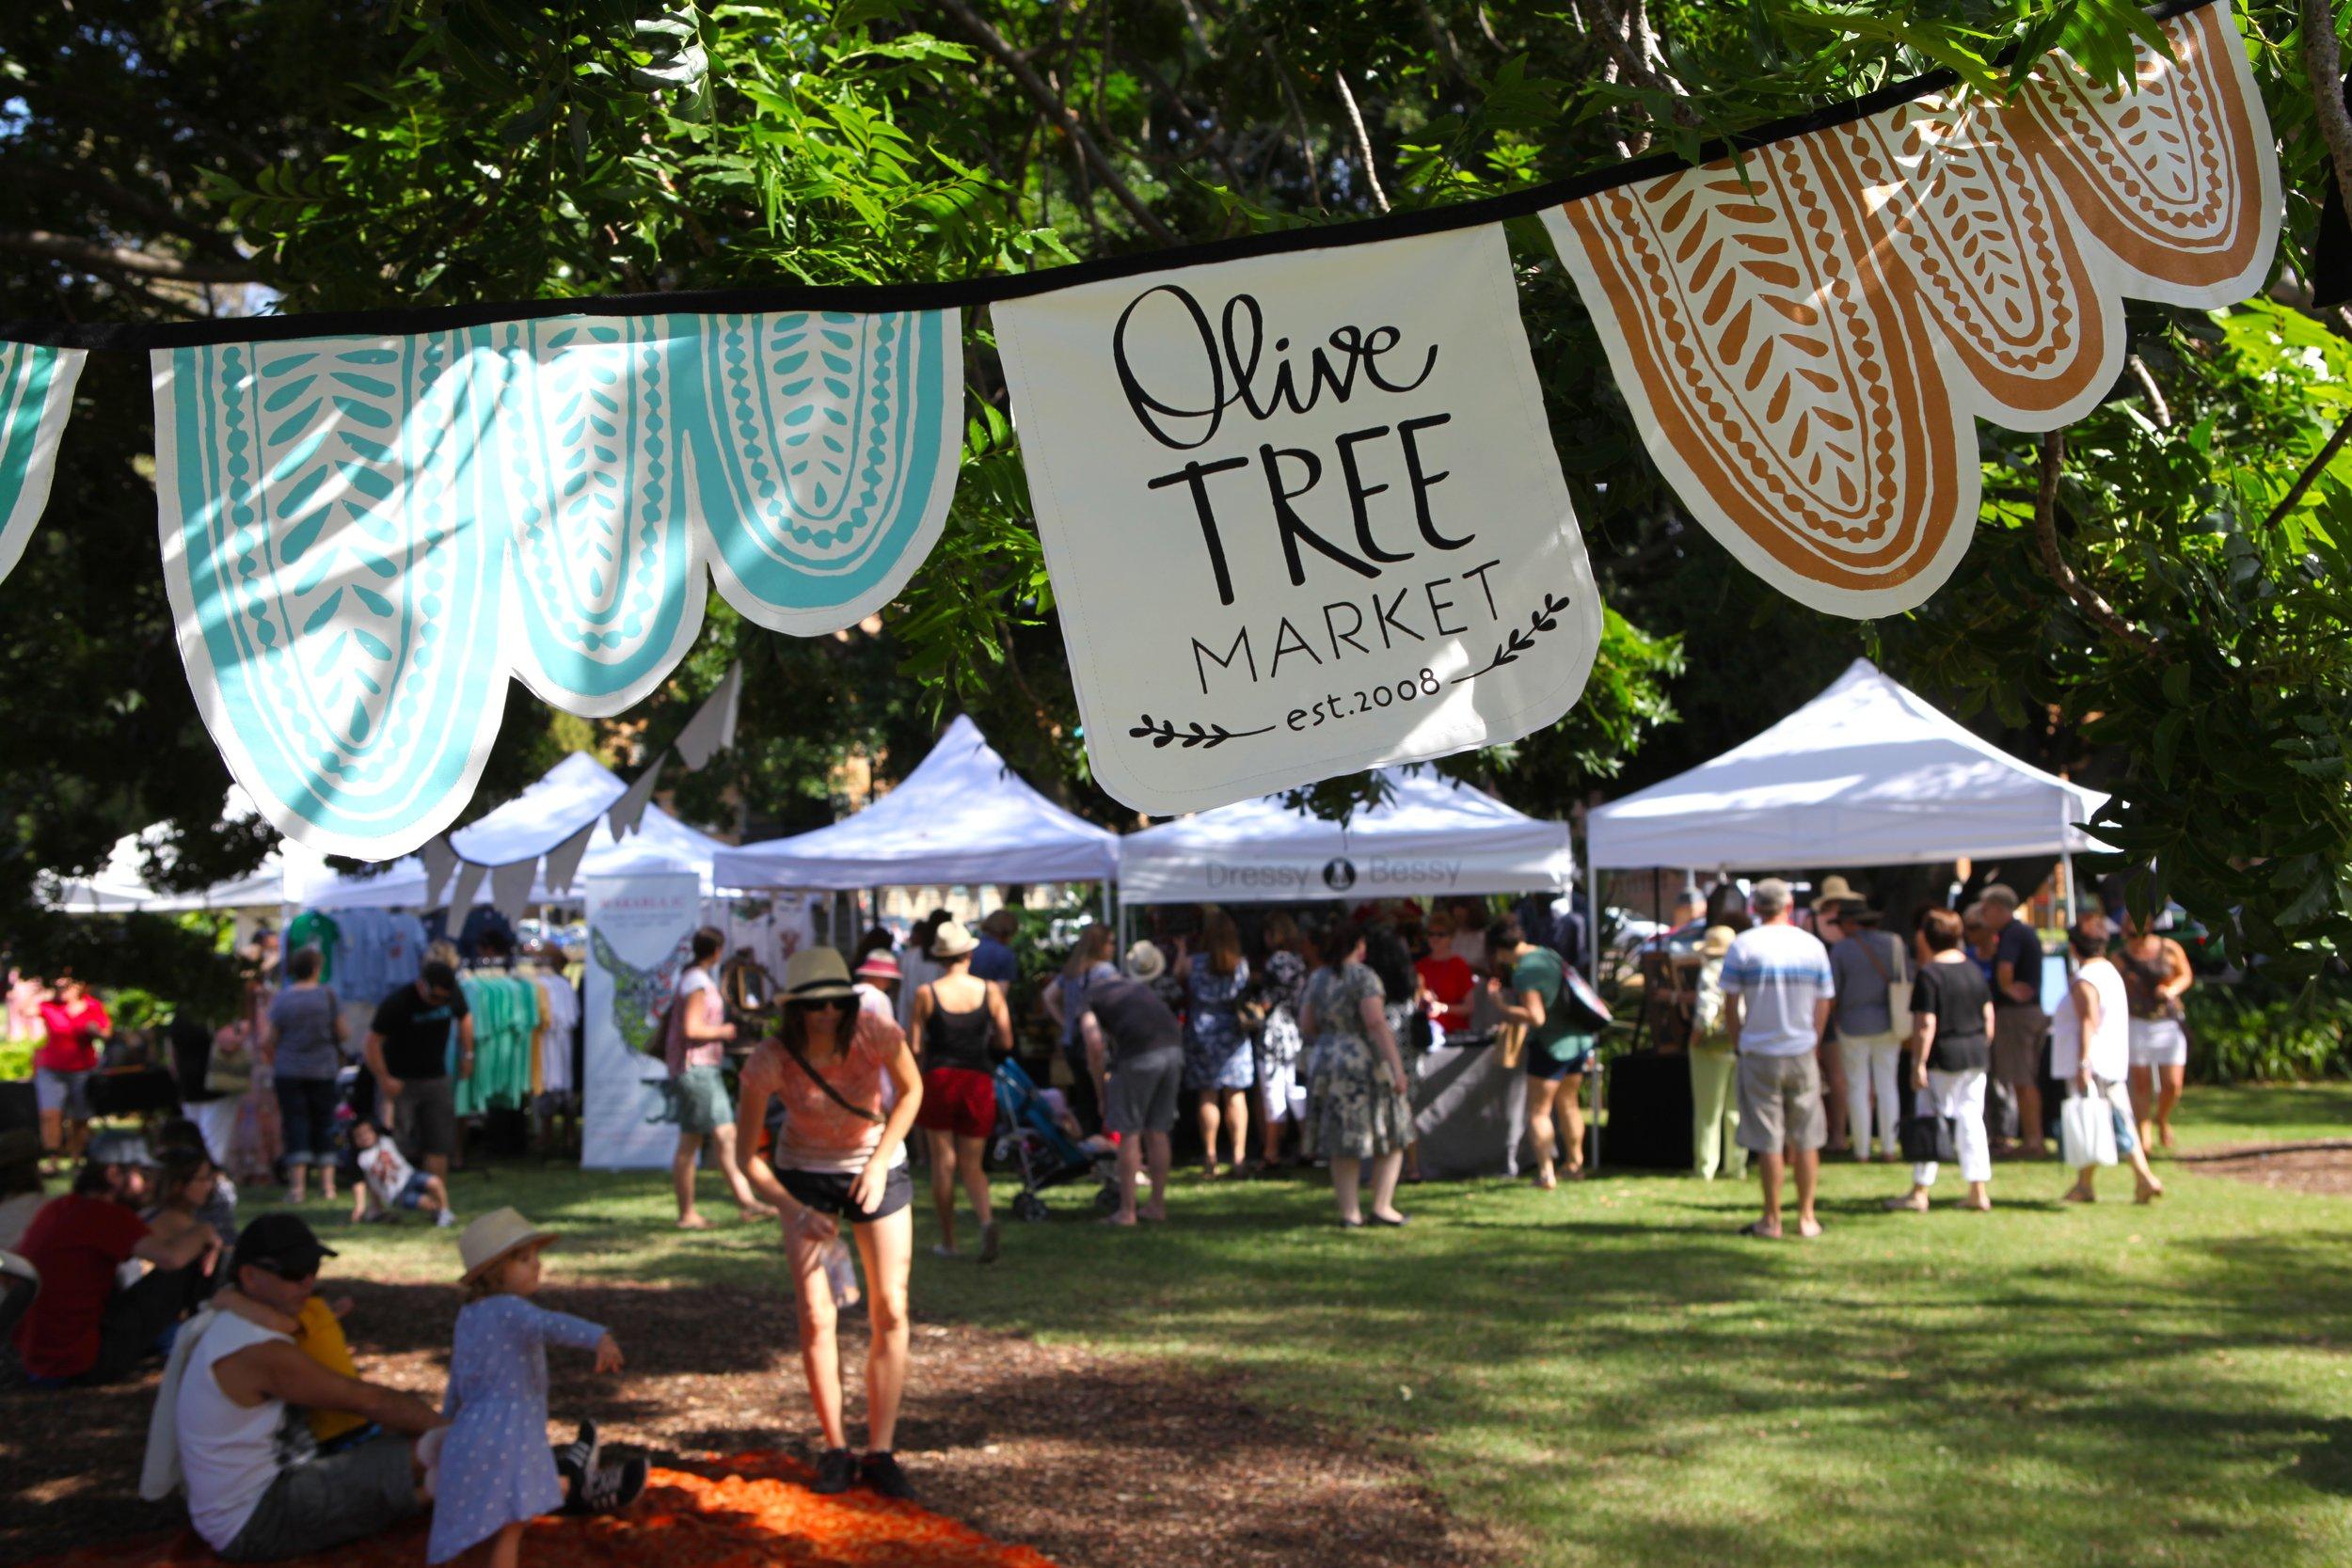 Olive Tree_Market Image_Bunting.jpg